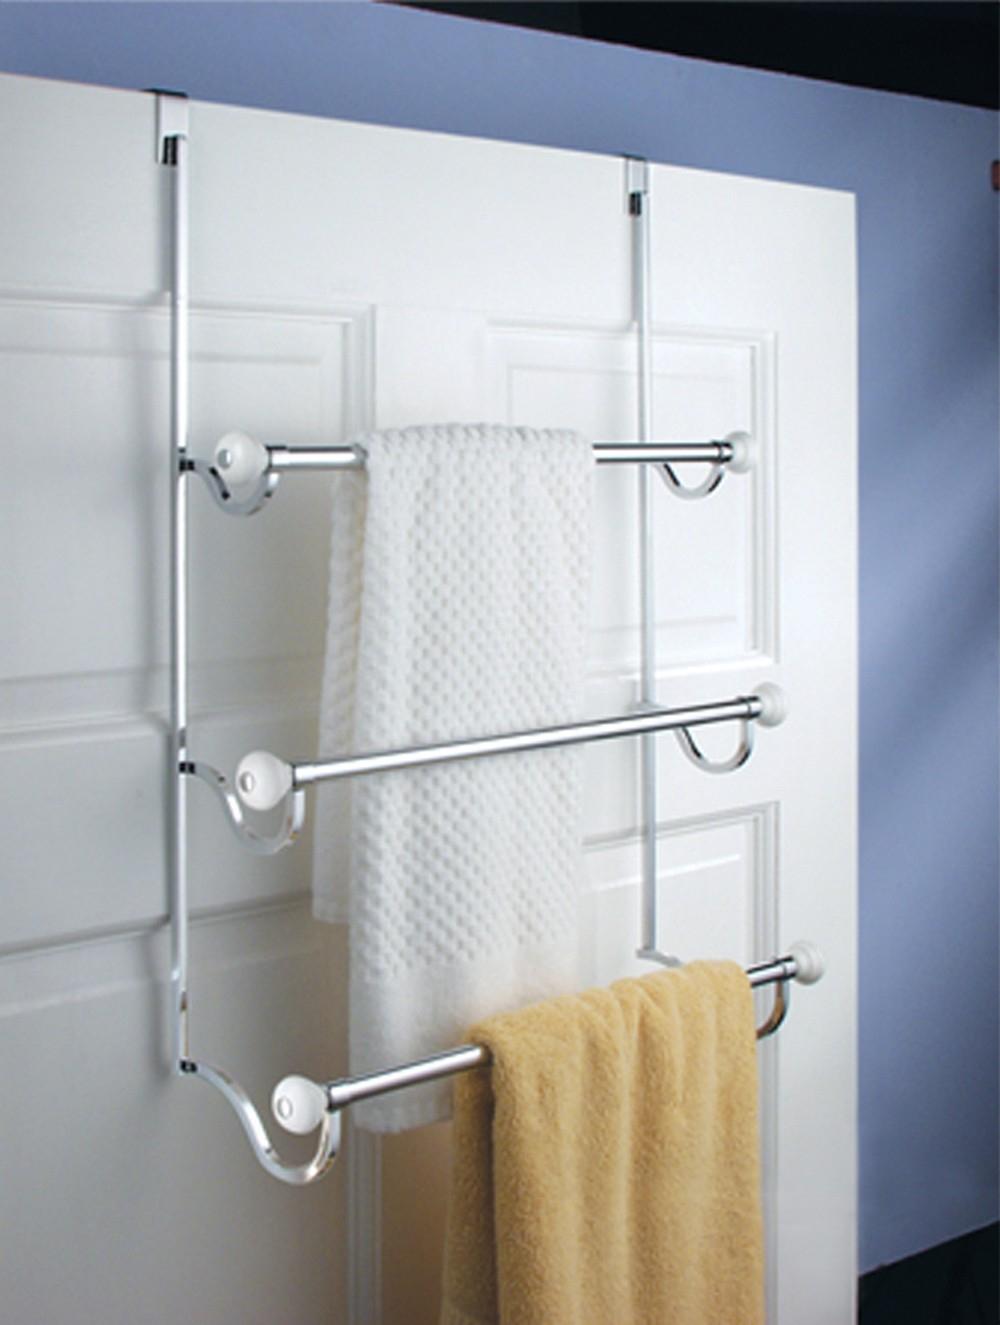 Laundry Shelving Solutions Door Hinge Towel Rack Bathroom for dimensions 1000 X 1325